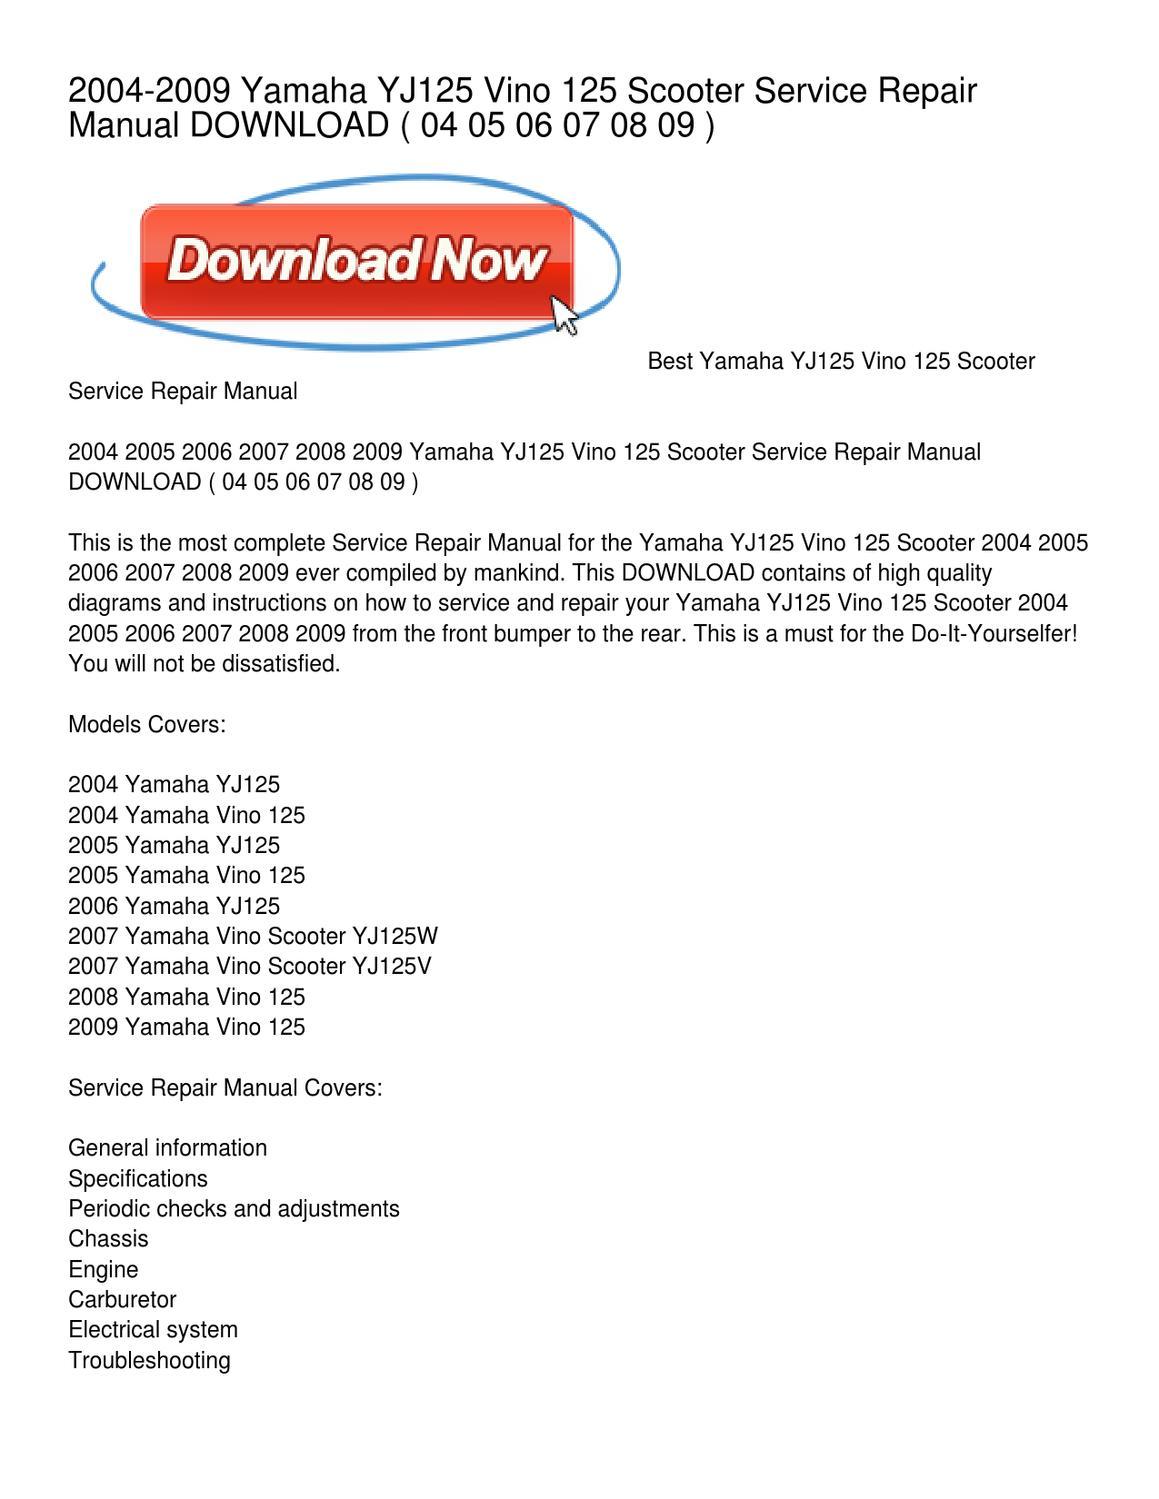 2004-2009 Yamaha YJ125 Vino 125 Scooter Service Repair Manual DOWNLOAD by  Emma Davis - issuu